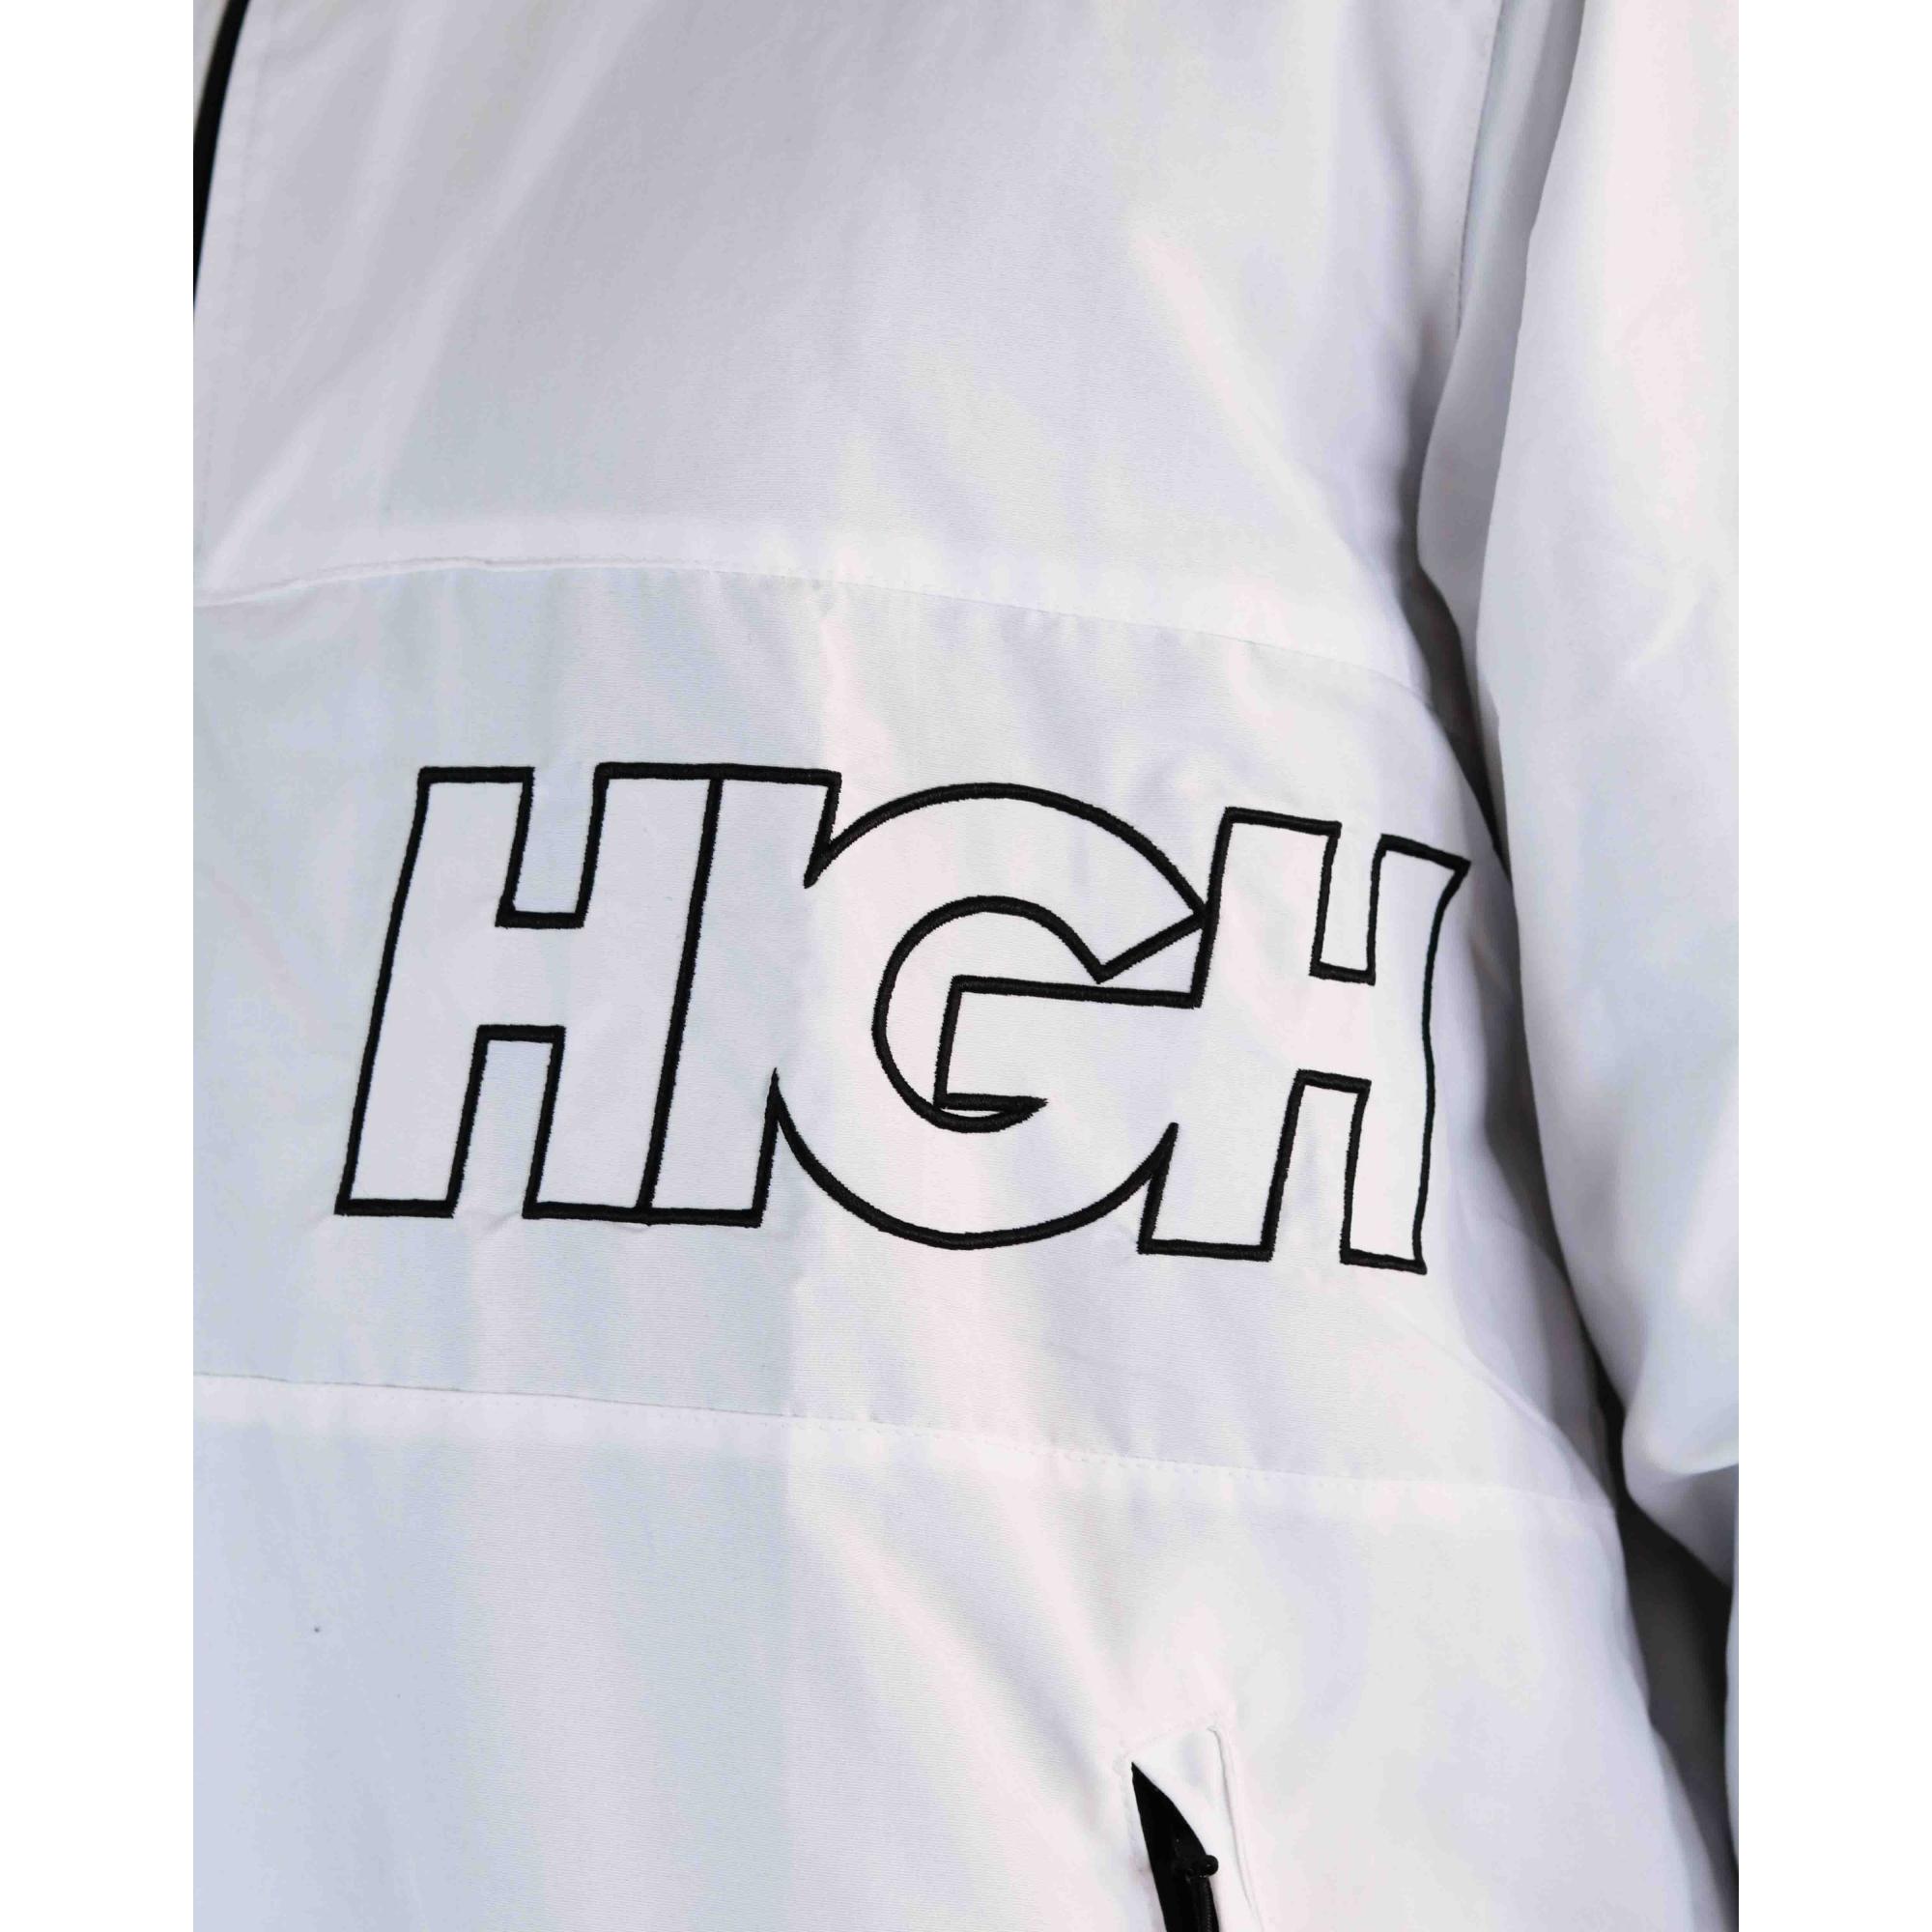 JAQUETA HIGH ANORAK WB041.02 - BCO